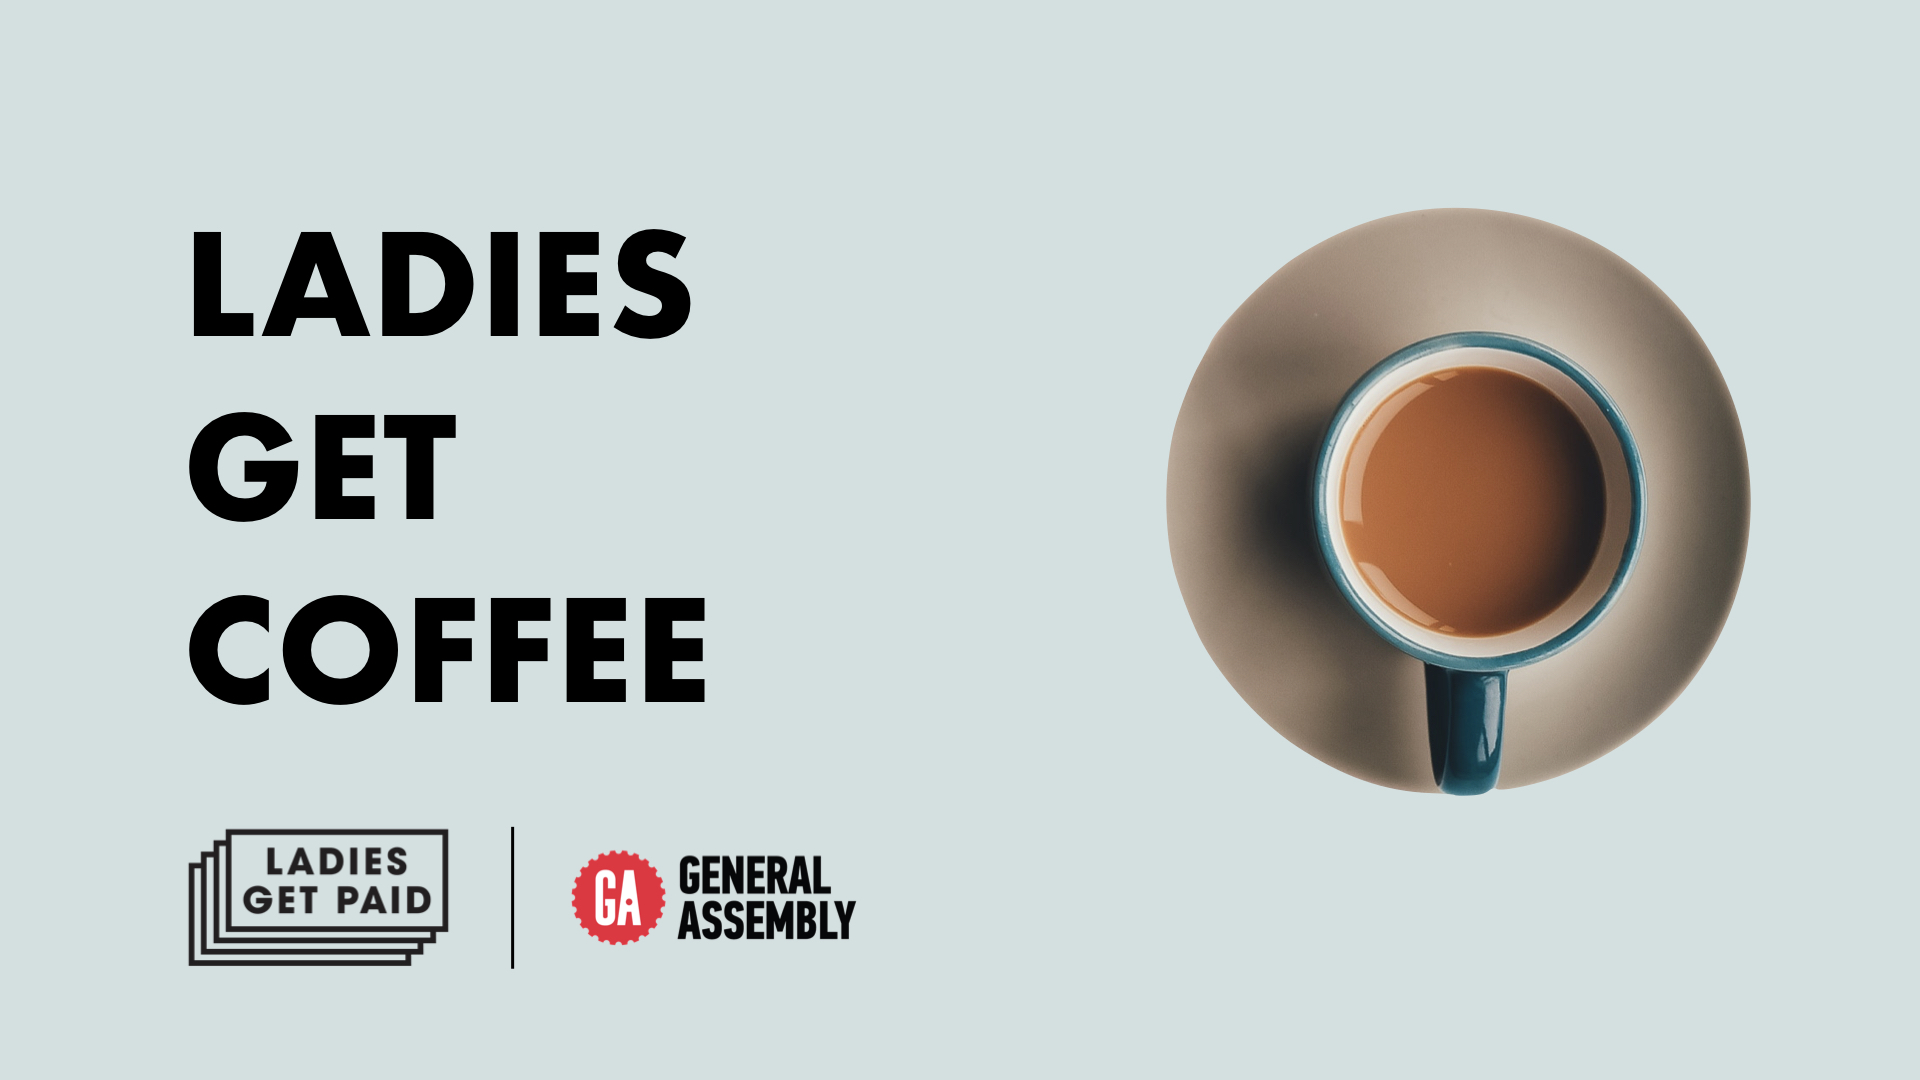 Ladies Get Coffee x GA.001.jpeg